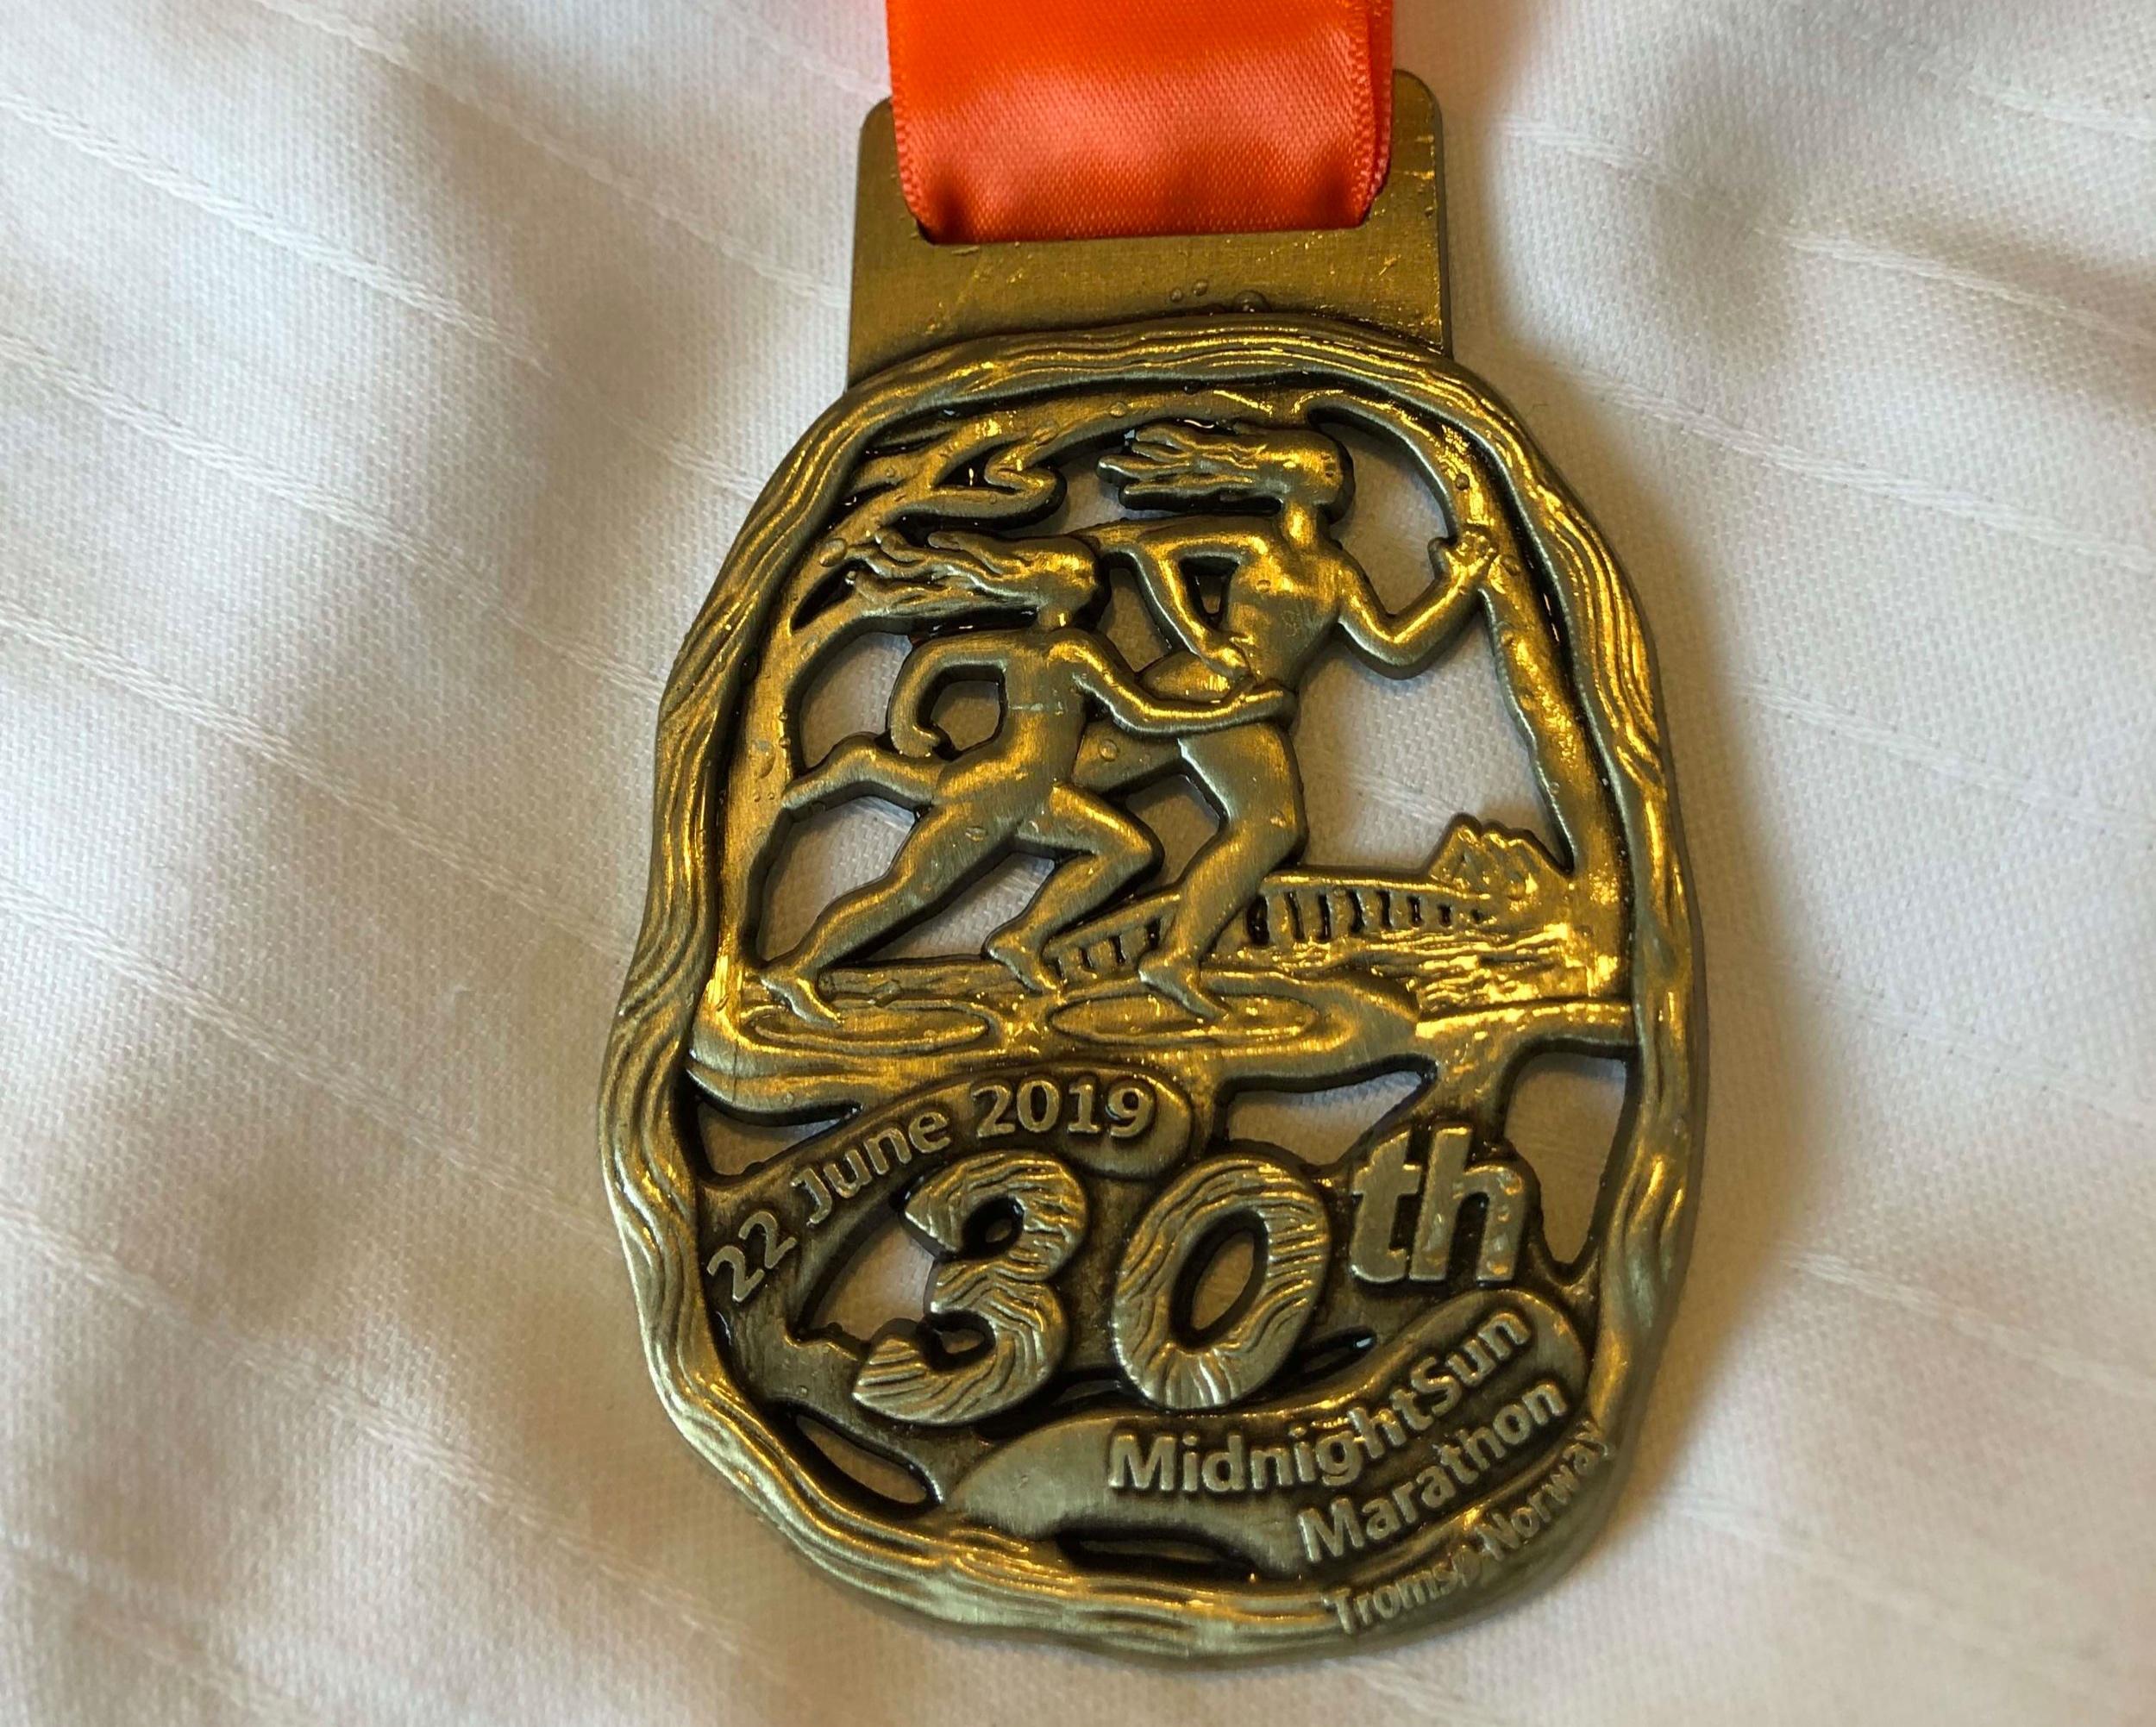 Midnight+Sun+Marathon+Medal.jpg